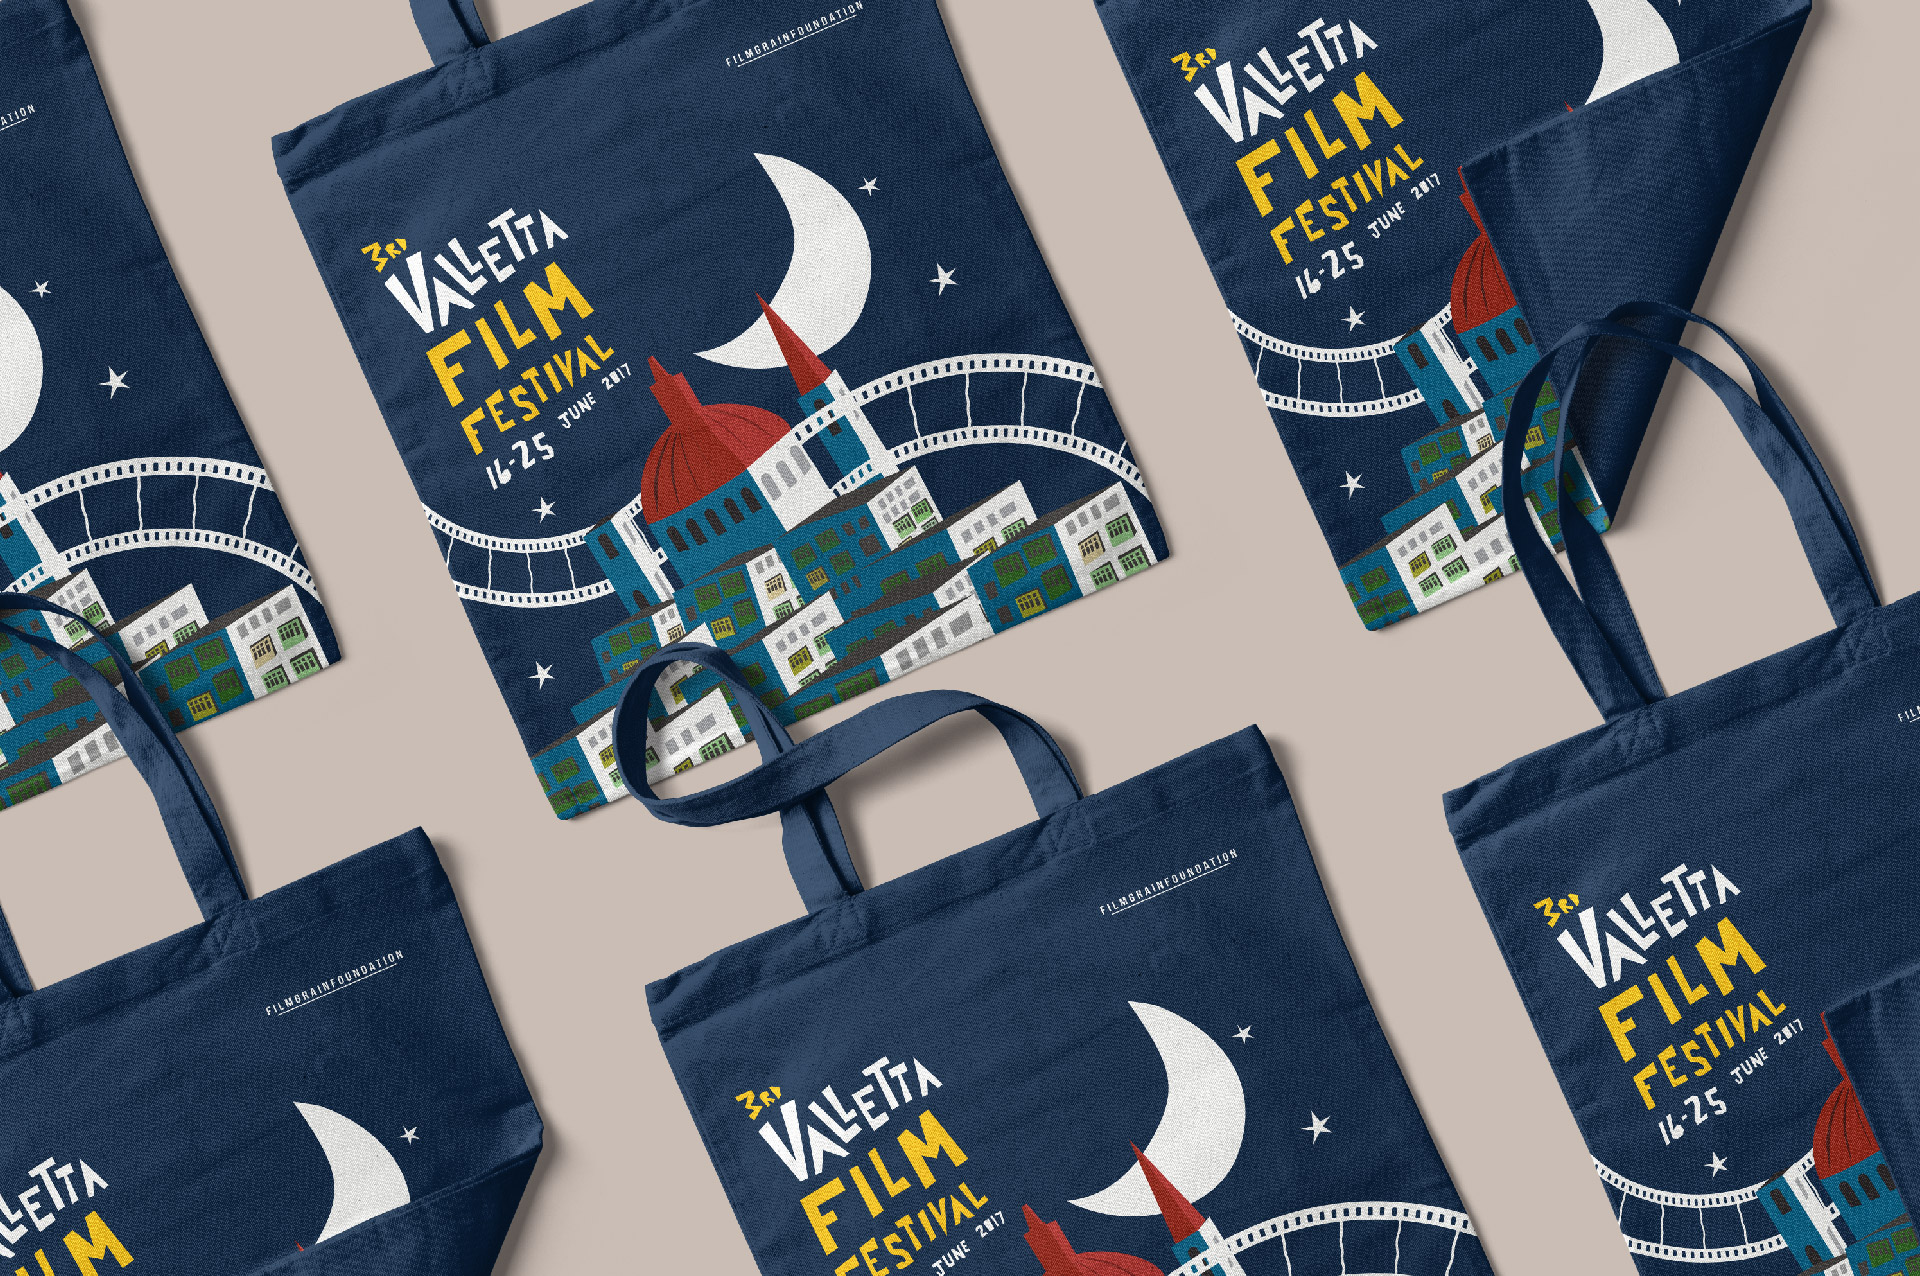 valletta film festival malta general condition design studio belgrade